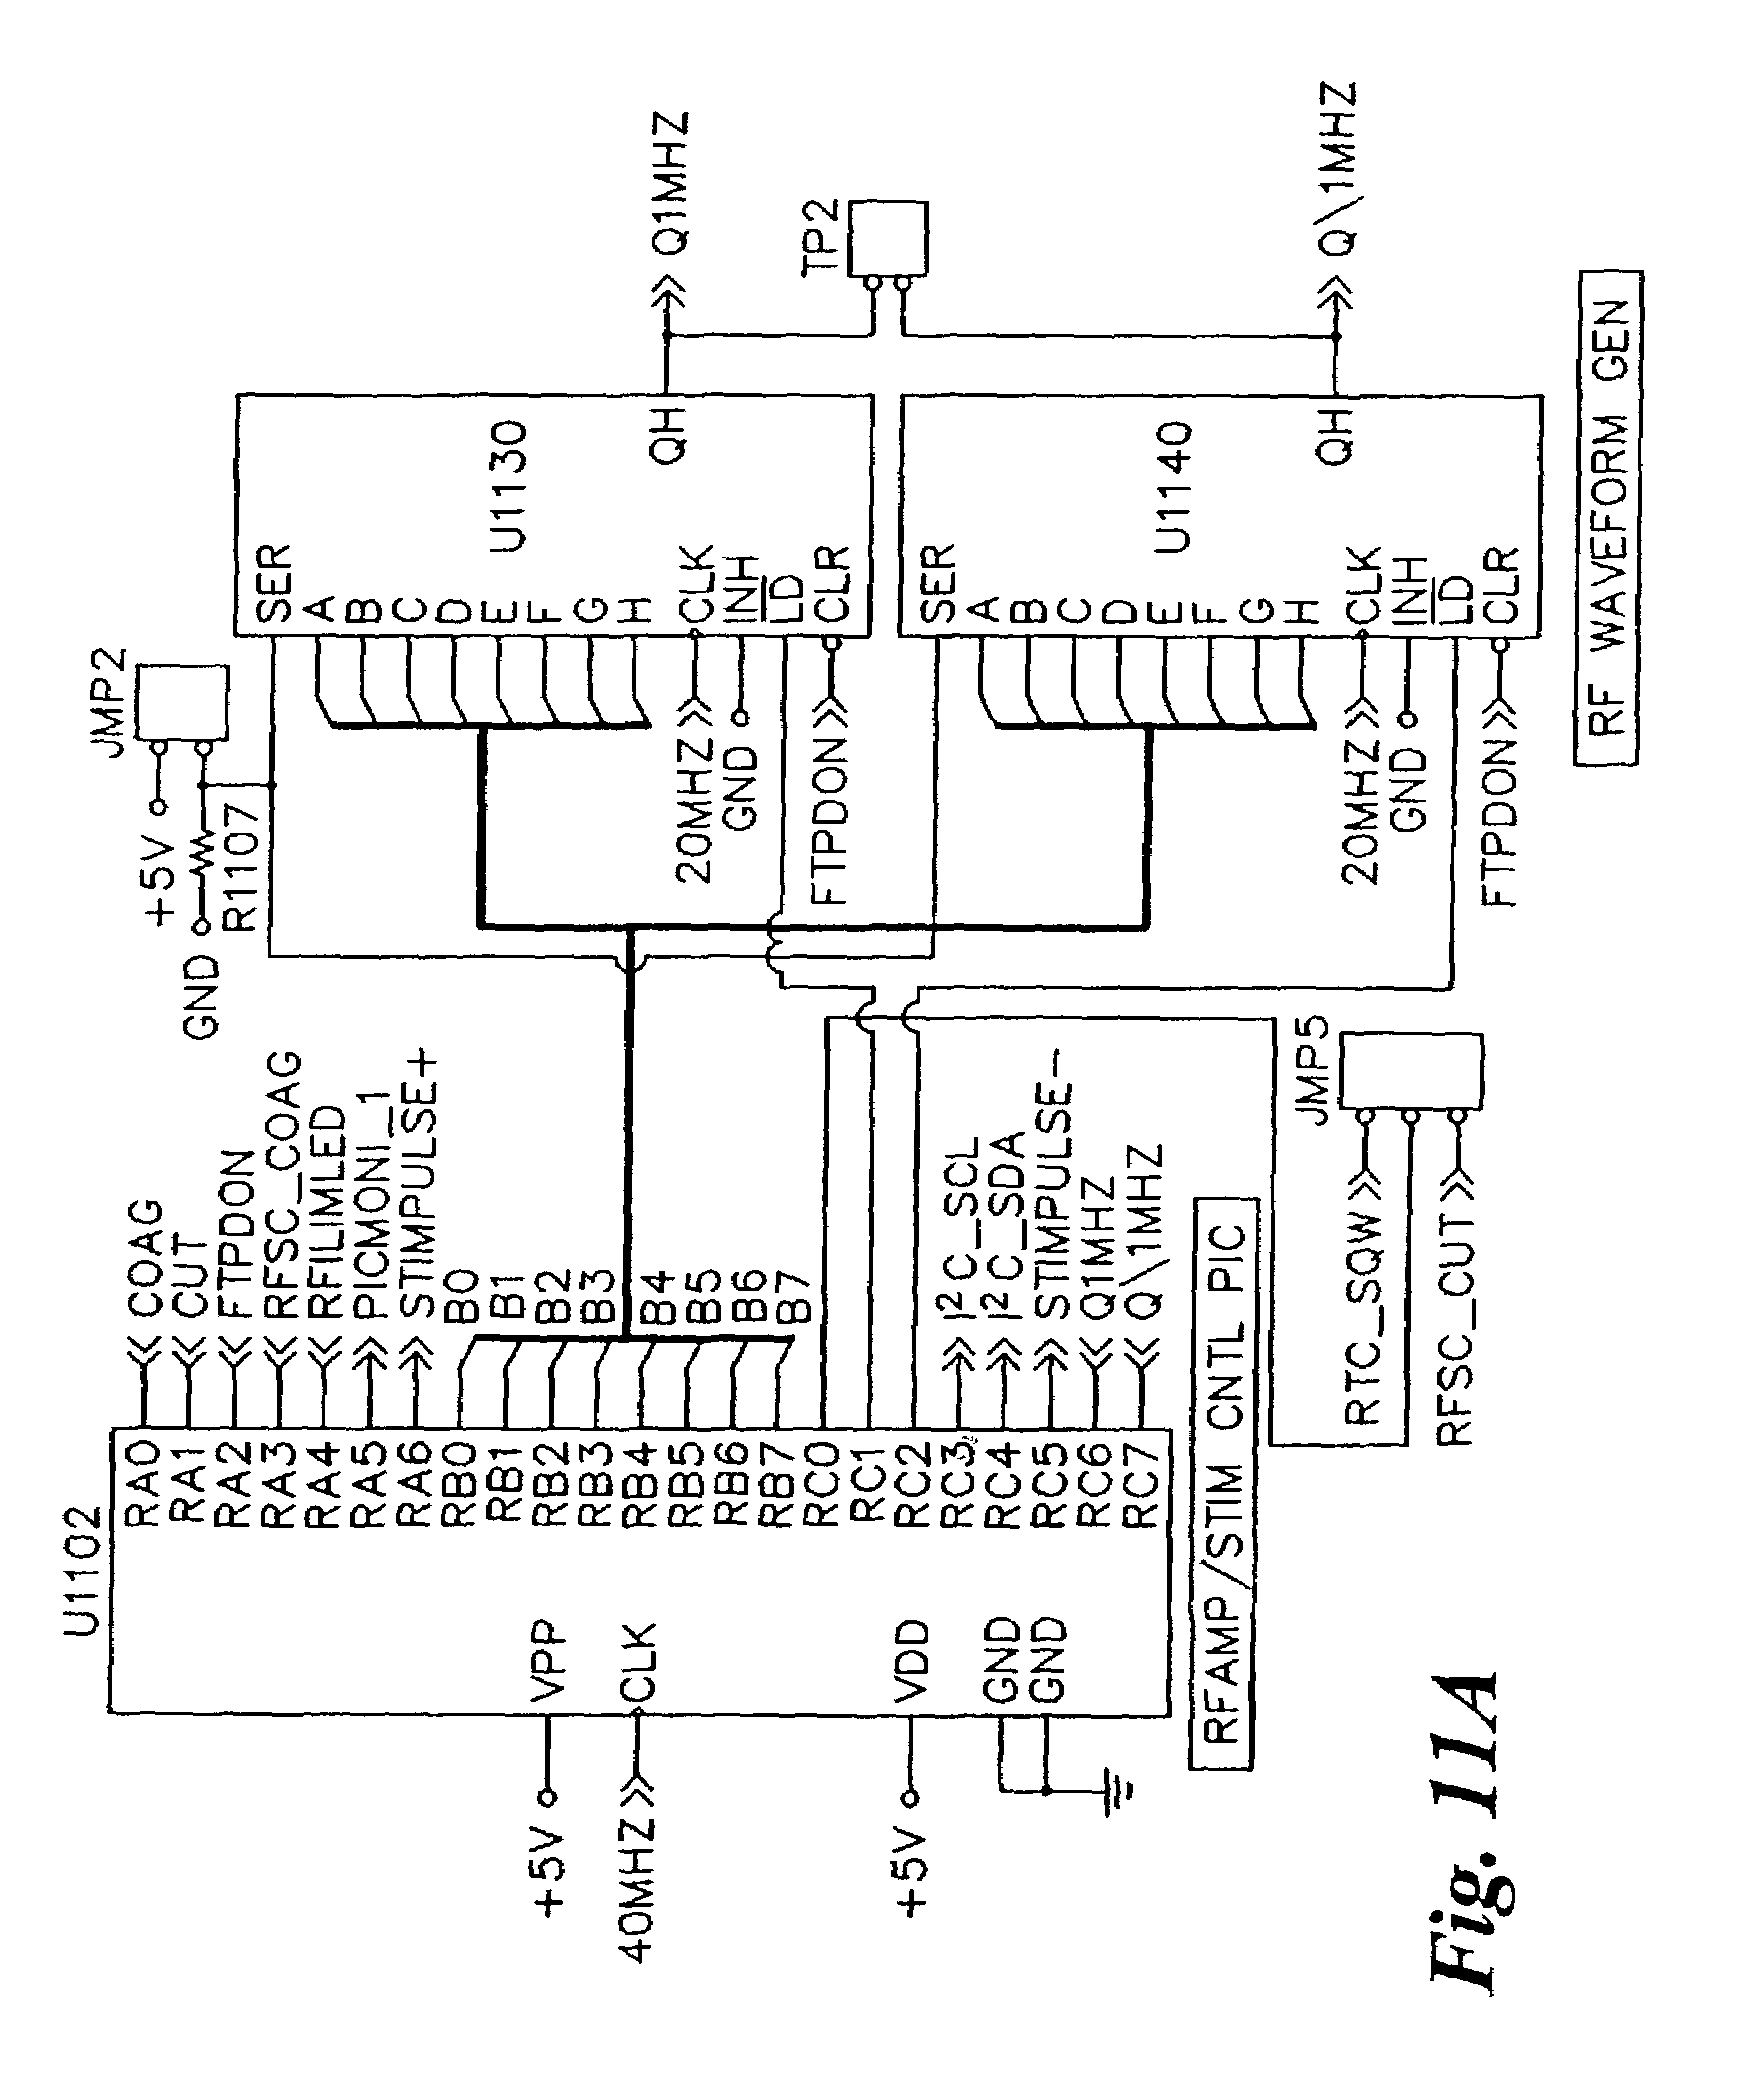 Taylor Dunn B2 48 Wiring Diagram